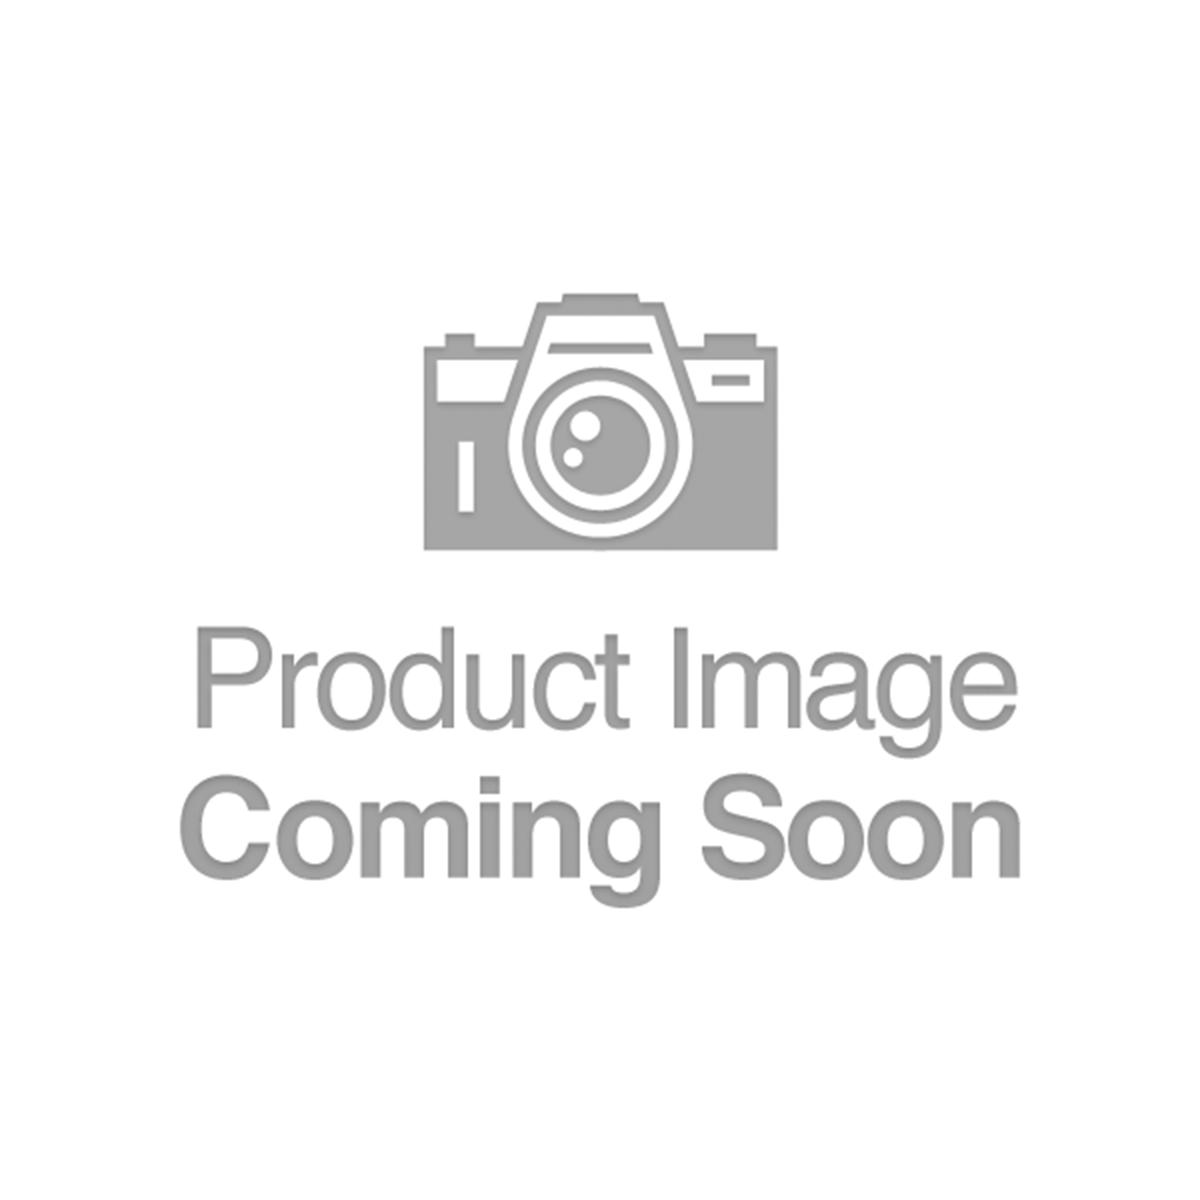 Tempe - Arizona - CH 5720 - FR 633 - PMG 12